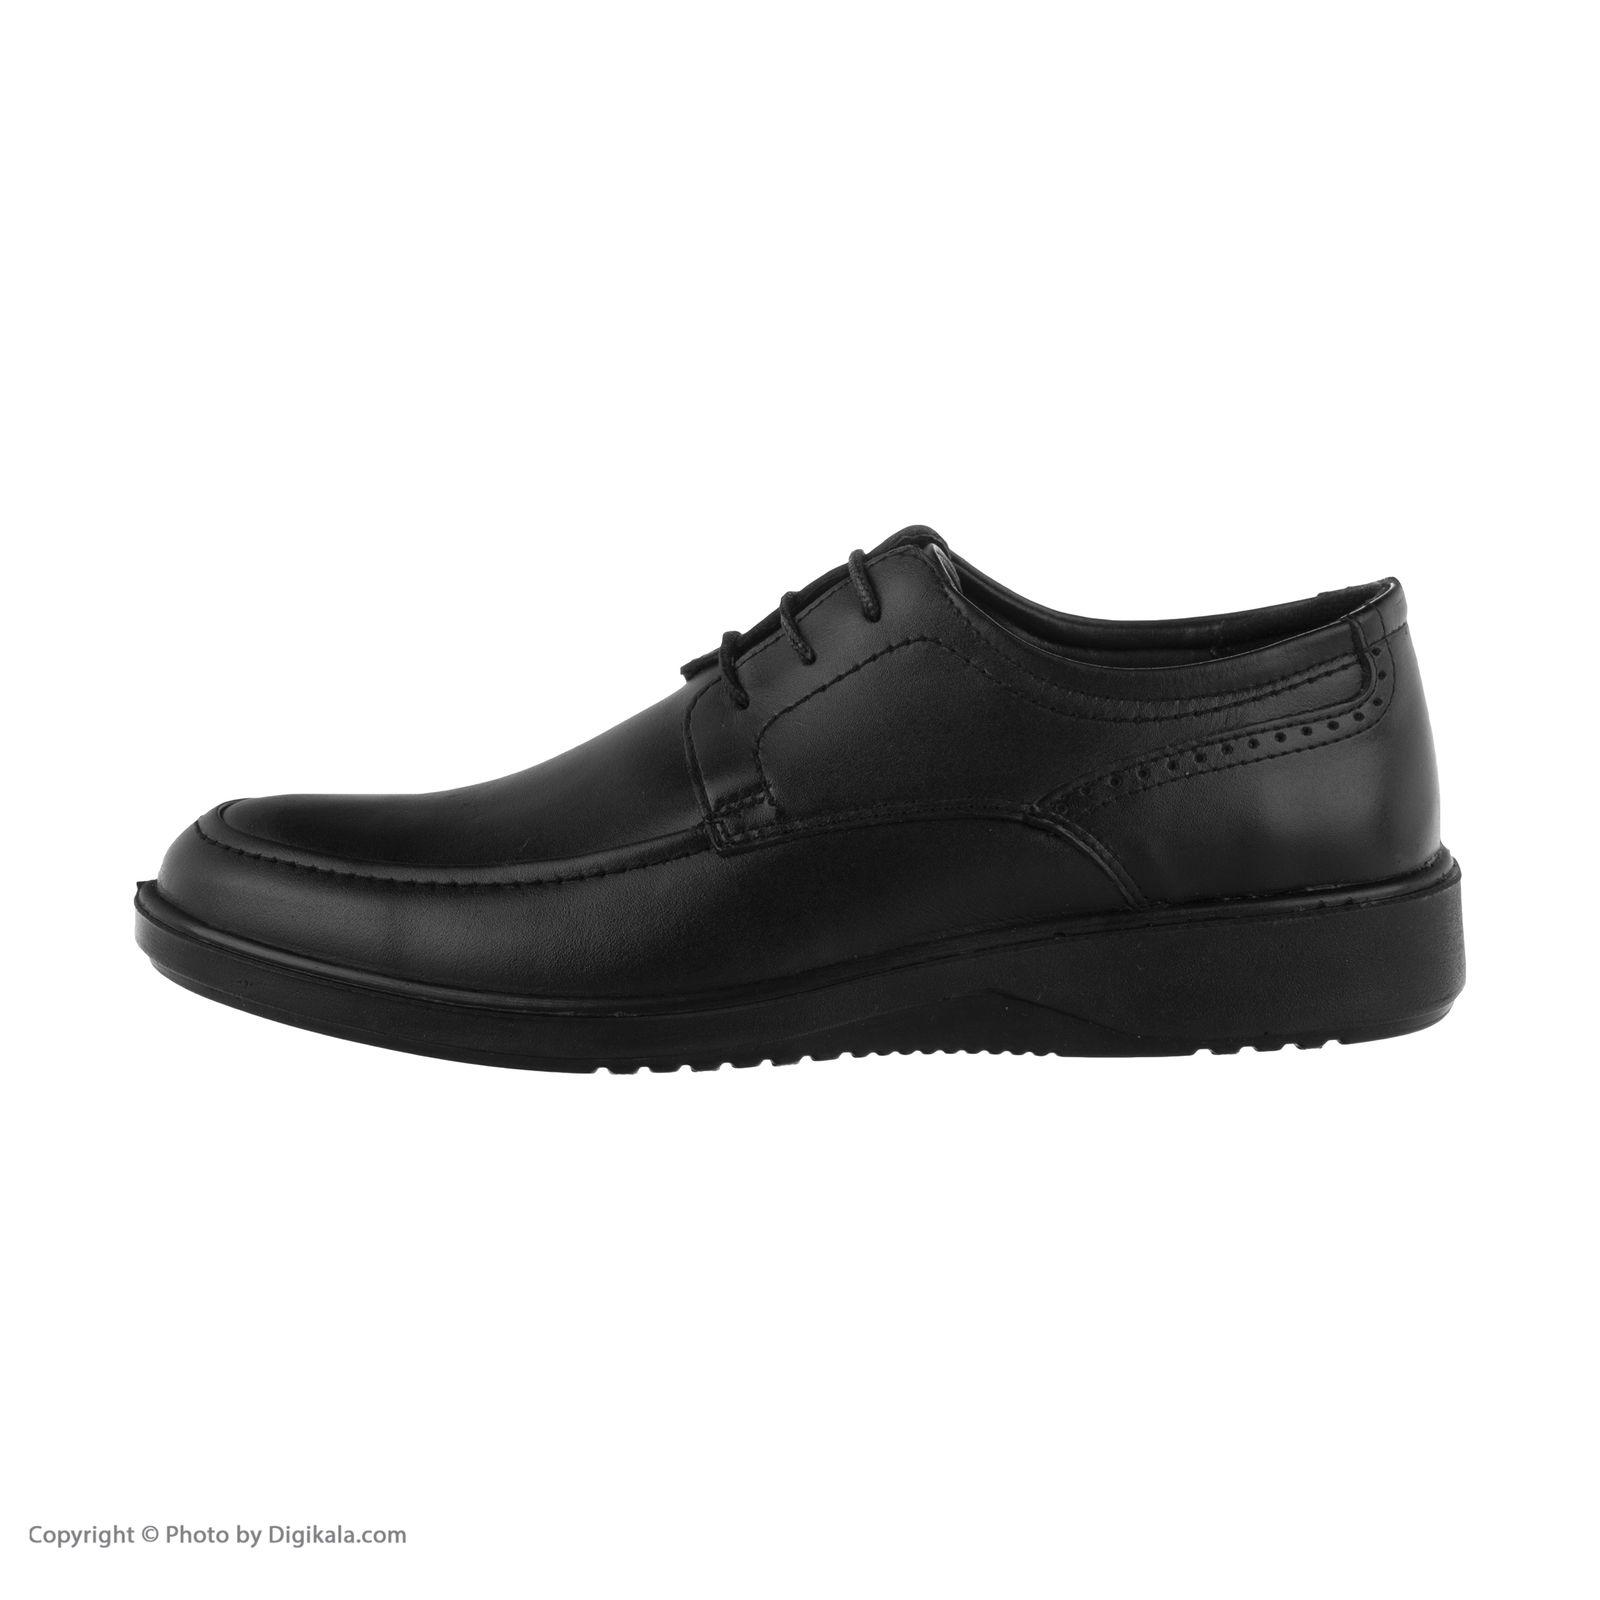 کفش روزمره مردانه سوته مدل 4994E503101 -  - 3